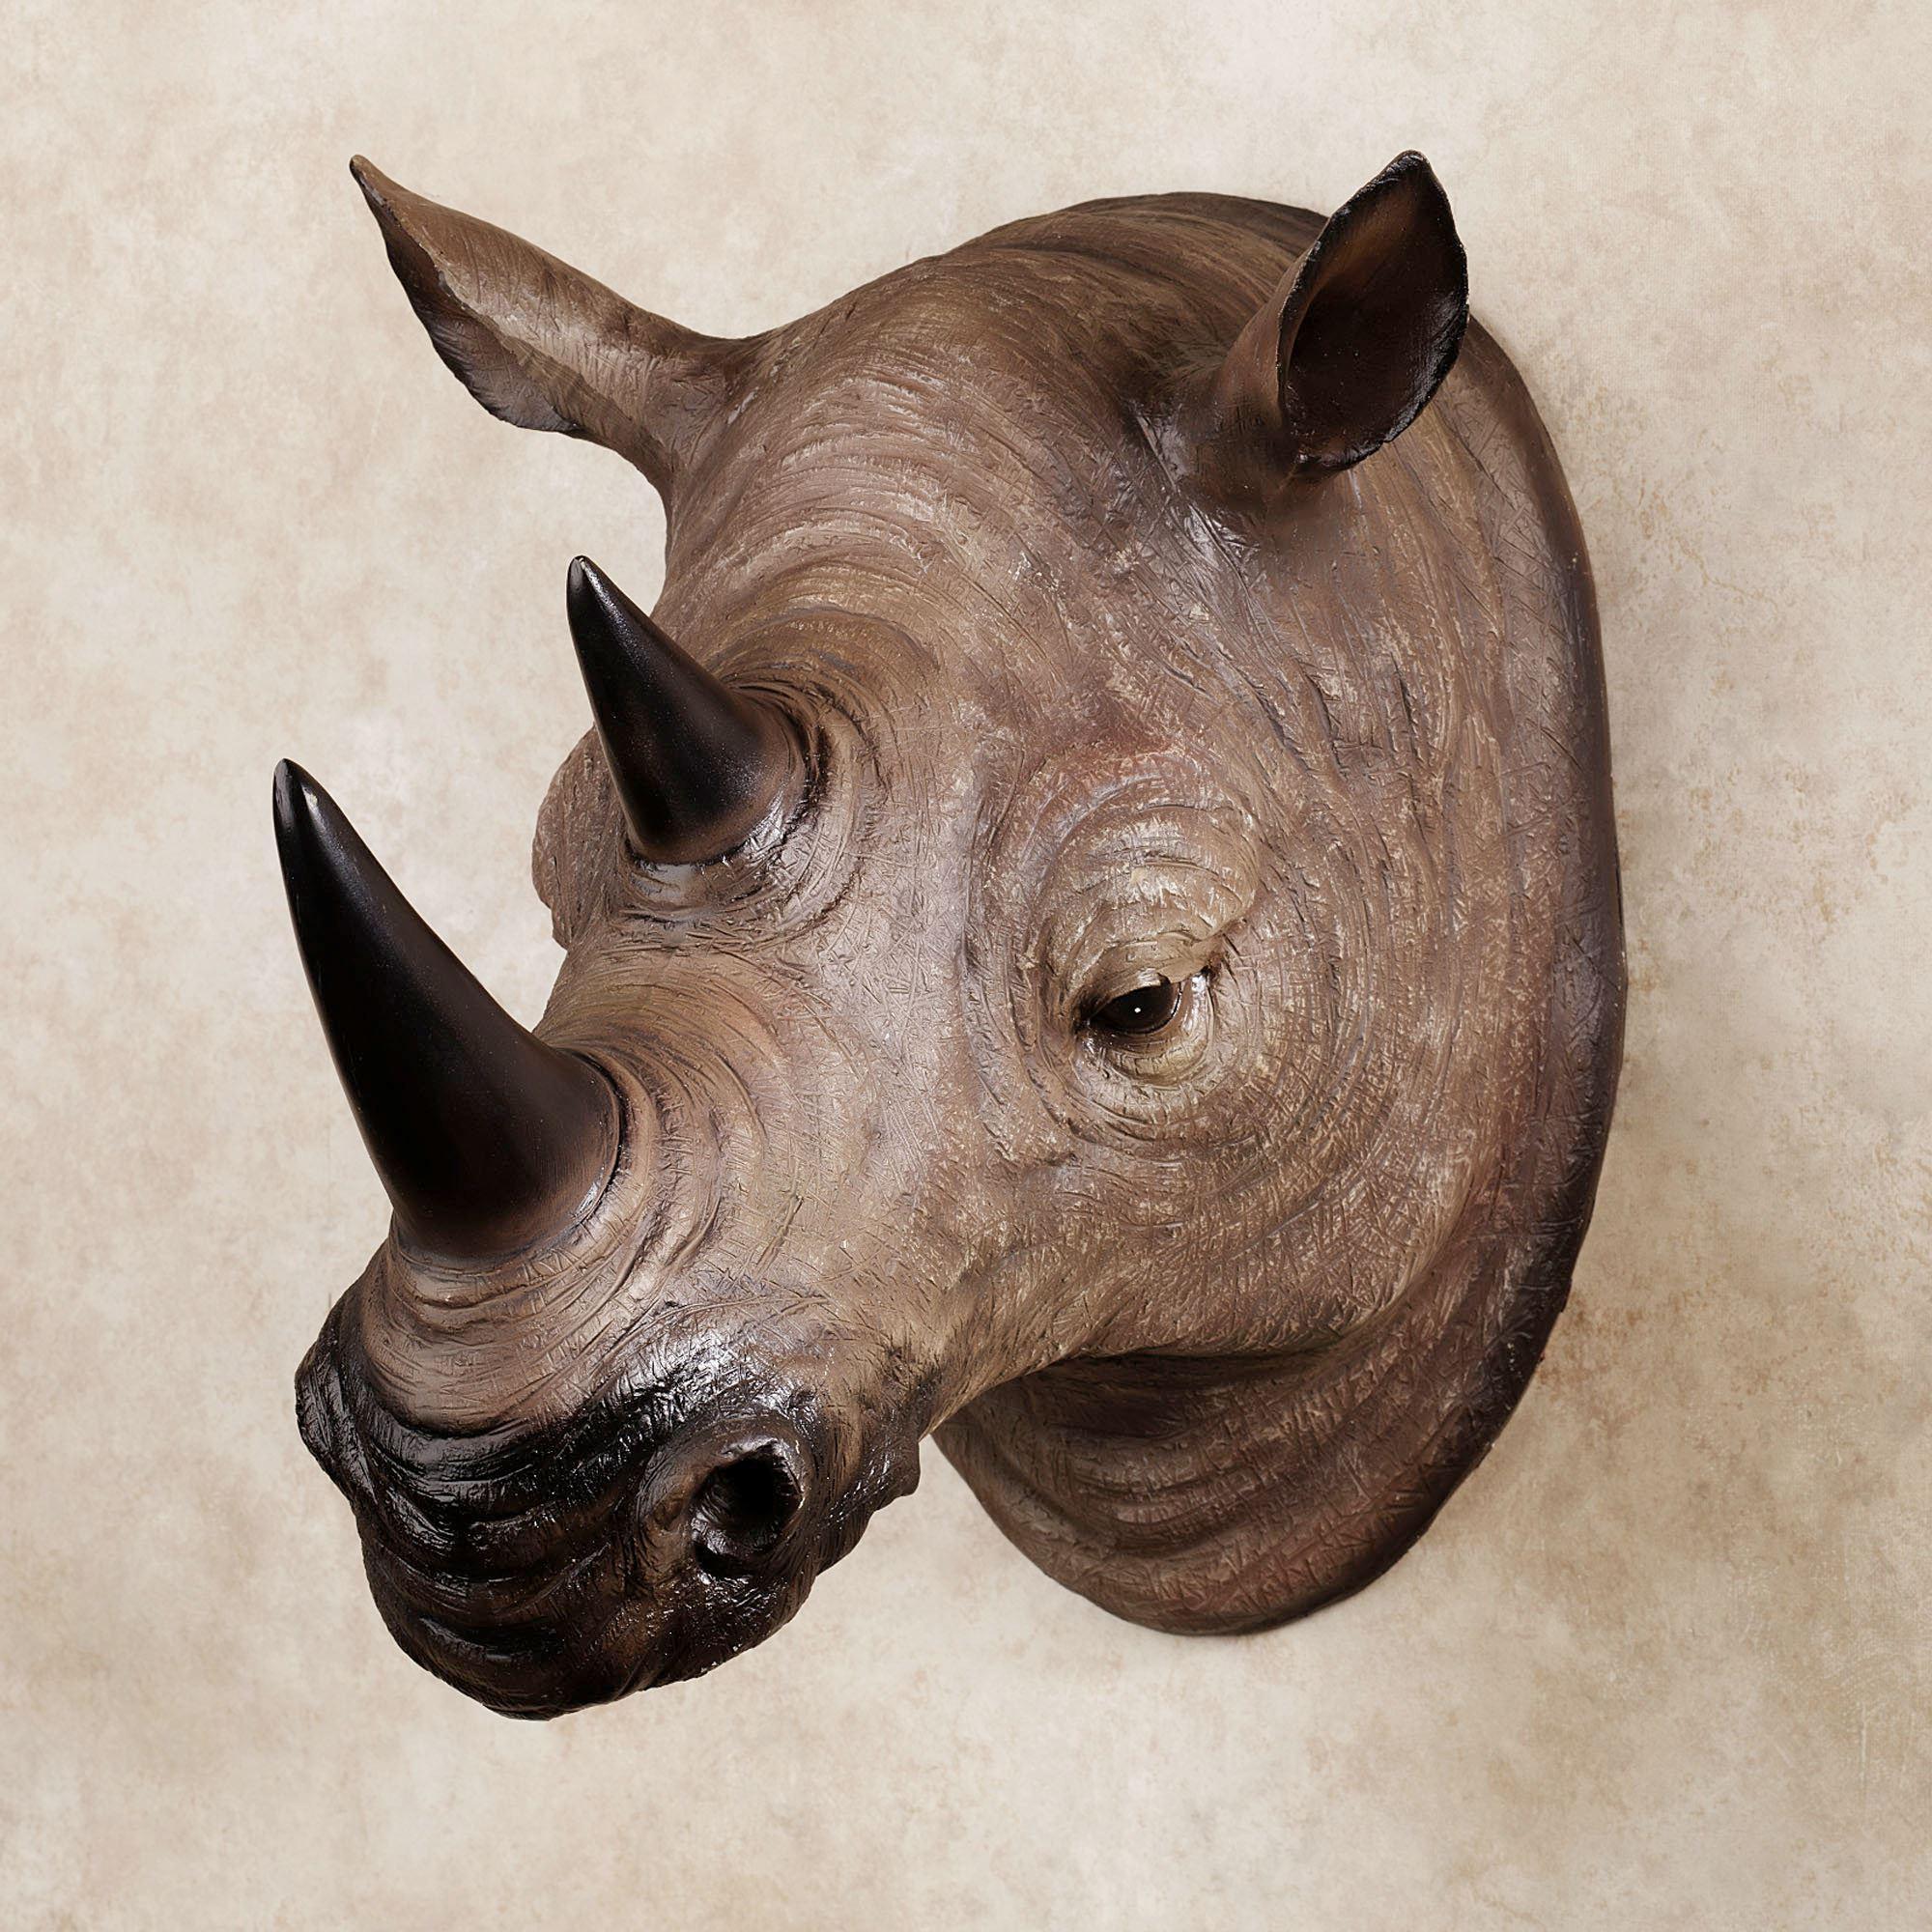 Resin Rhinoceros Head Wall Art Intended For Resin Animal Heads Wall Art (Image 11 of 20)